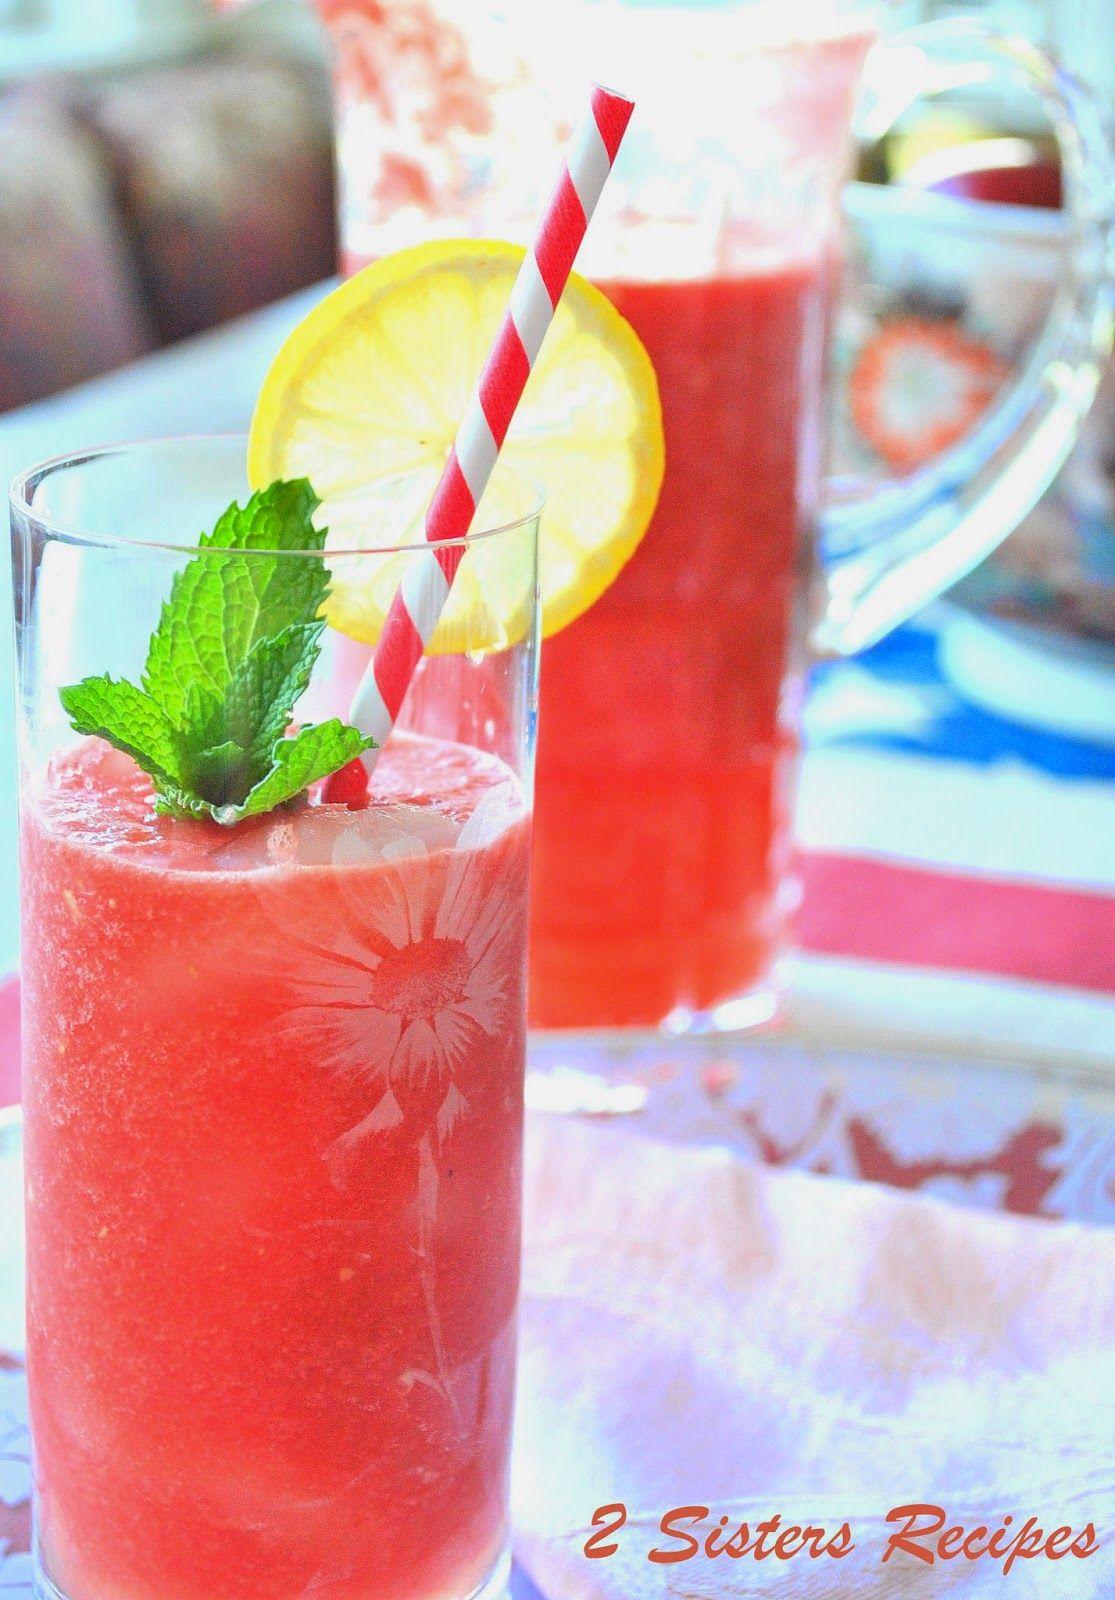 2 Sisters Recipes... by Anna and Liz: Fresh Watermelon Lemonade